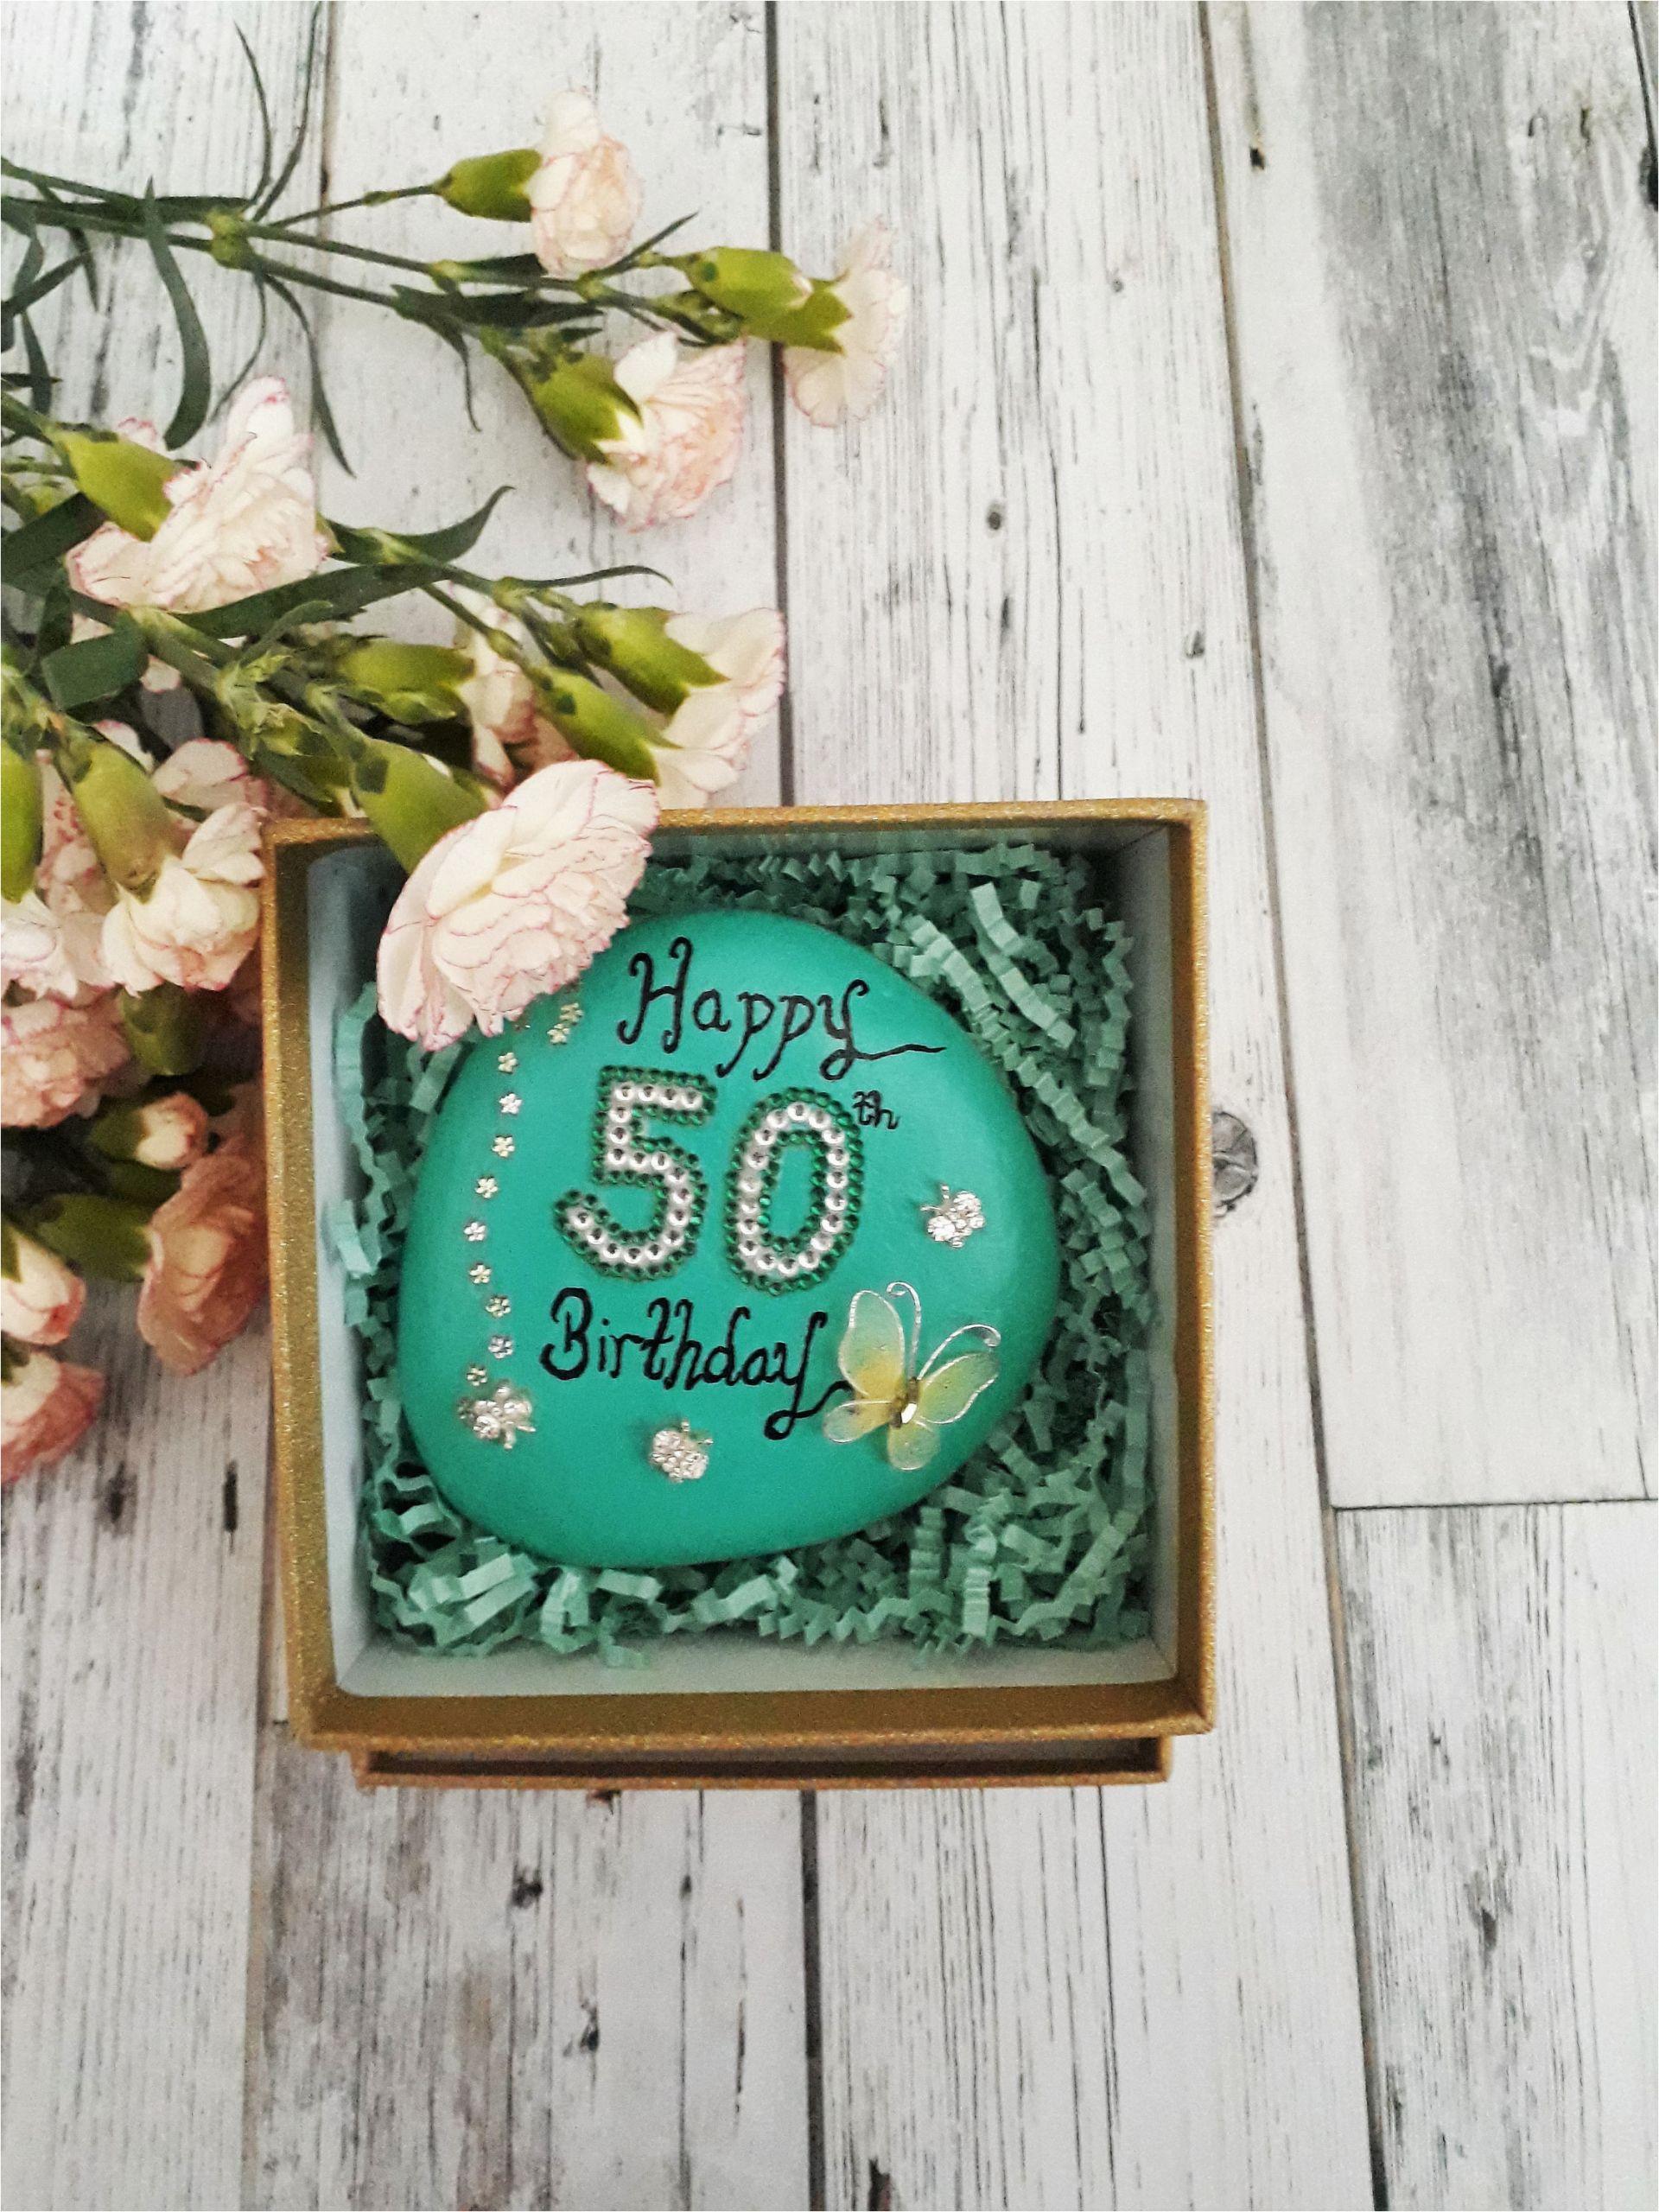 50th birthday gift for her 50th birthday